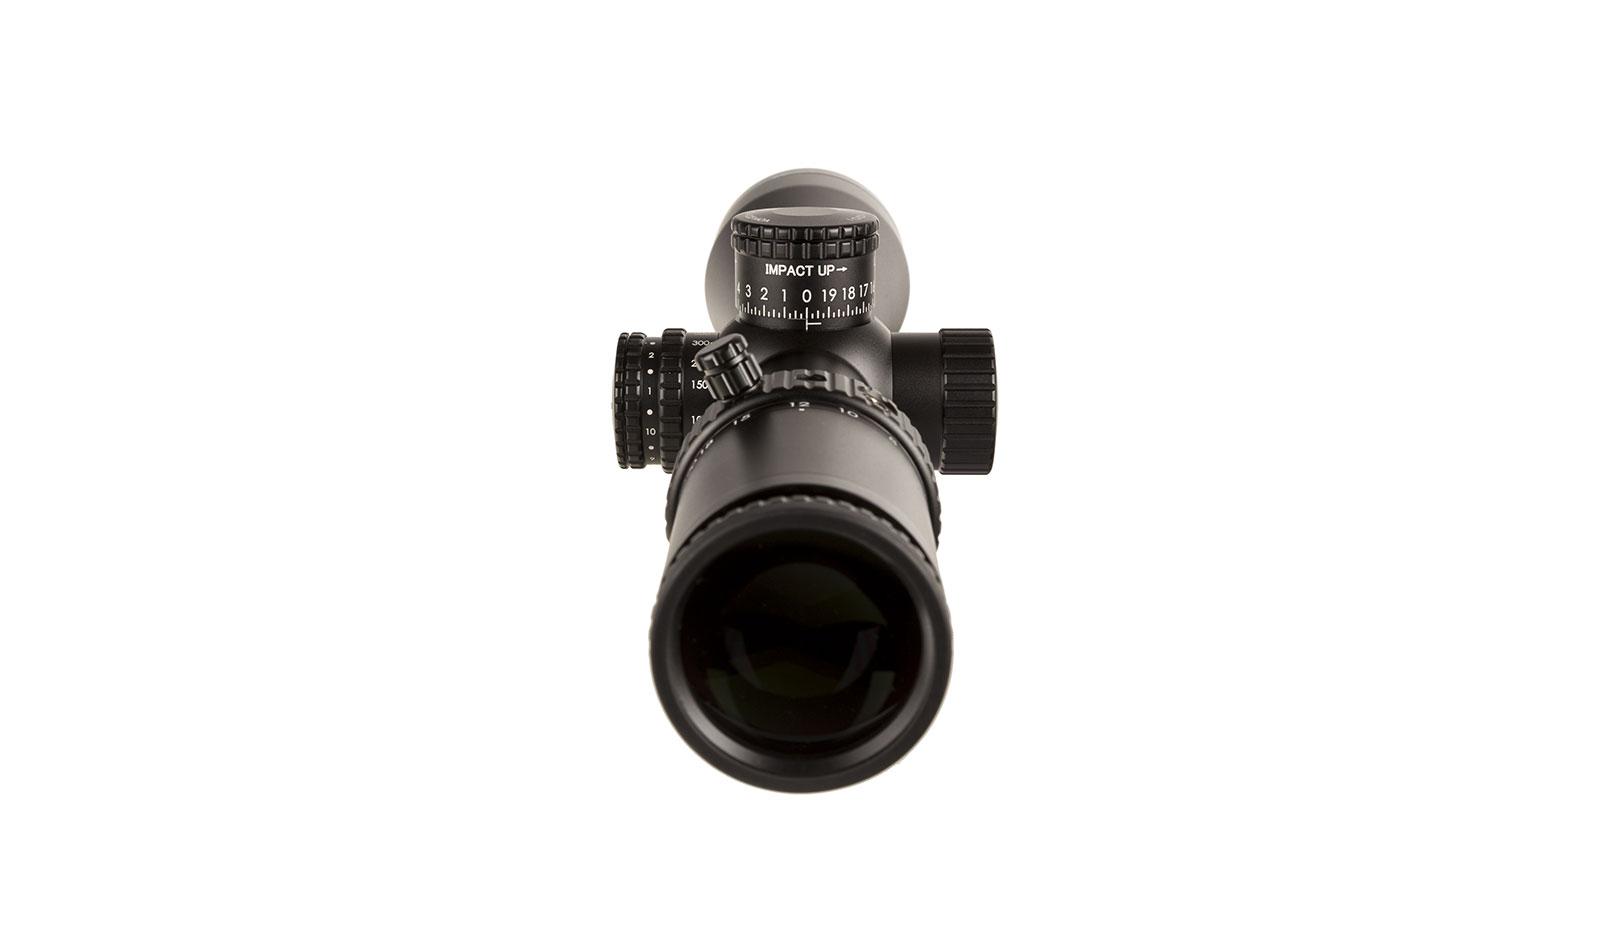 TMHX2550-C-3000010 angle 4